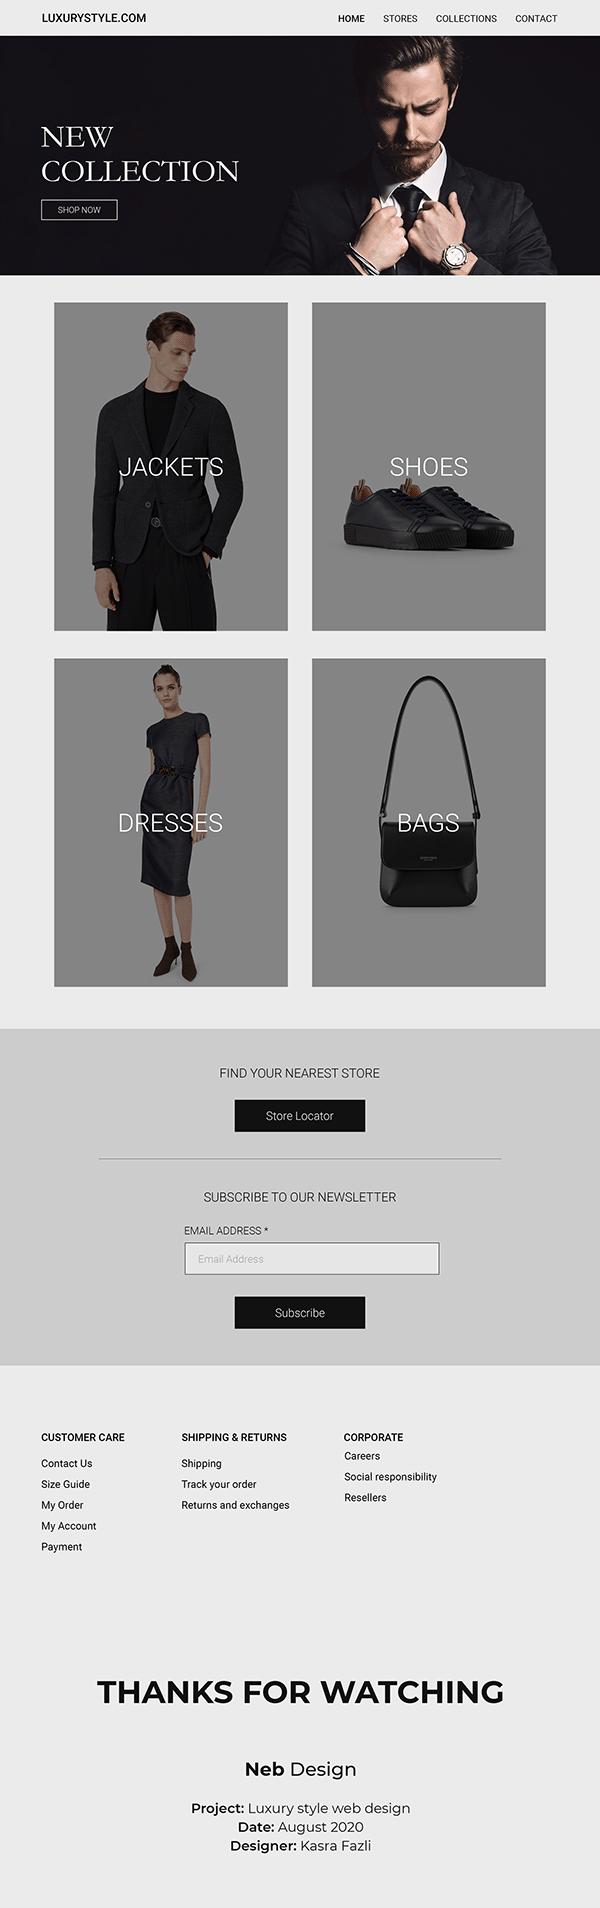 Luxury style web design